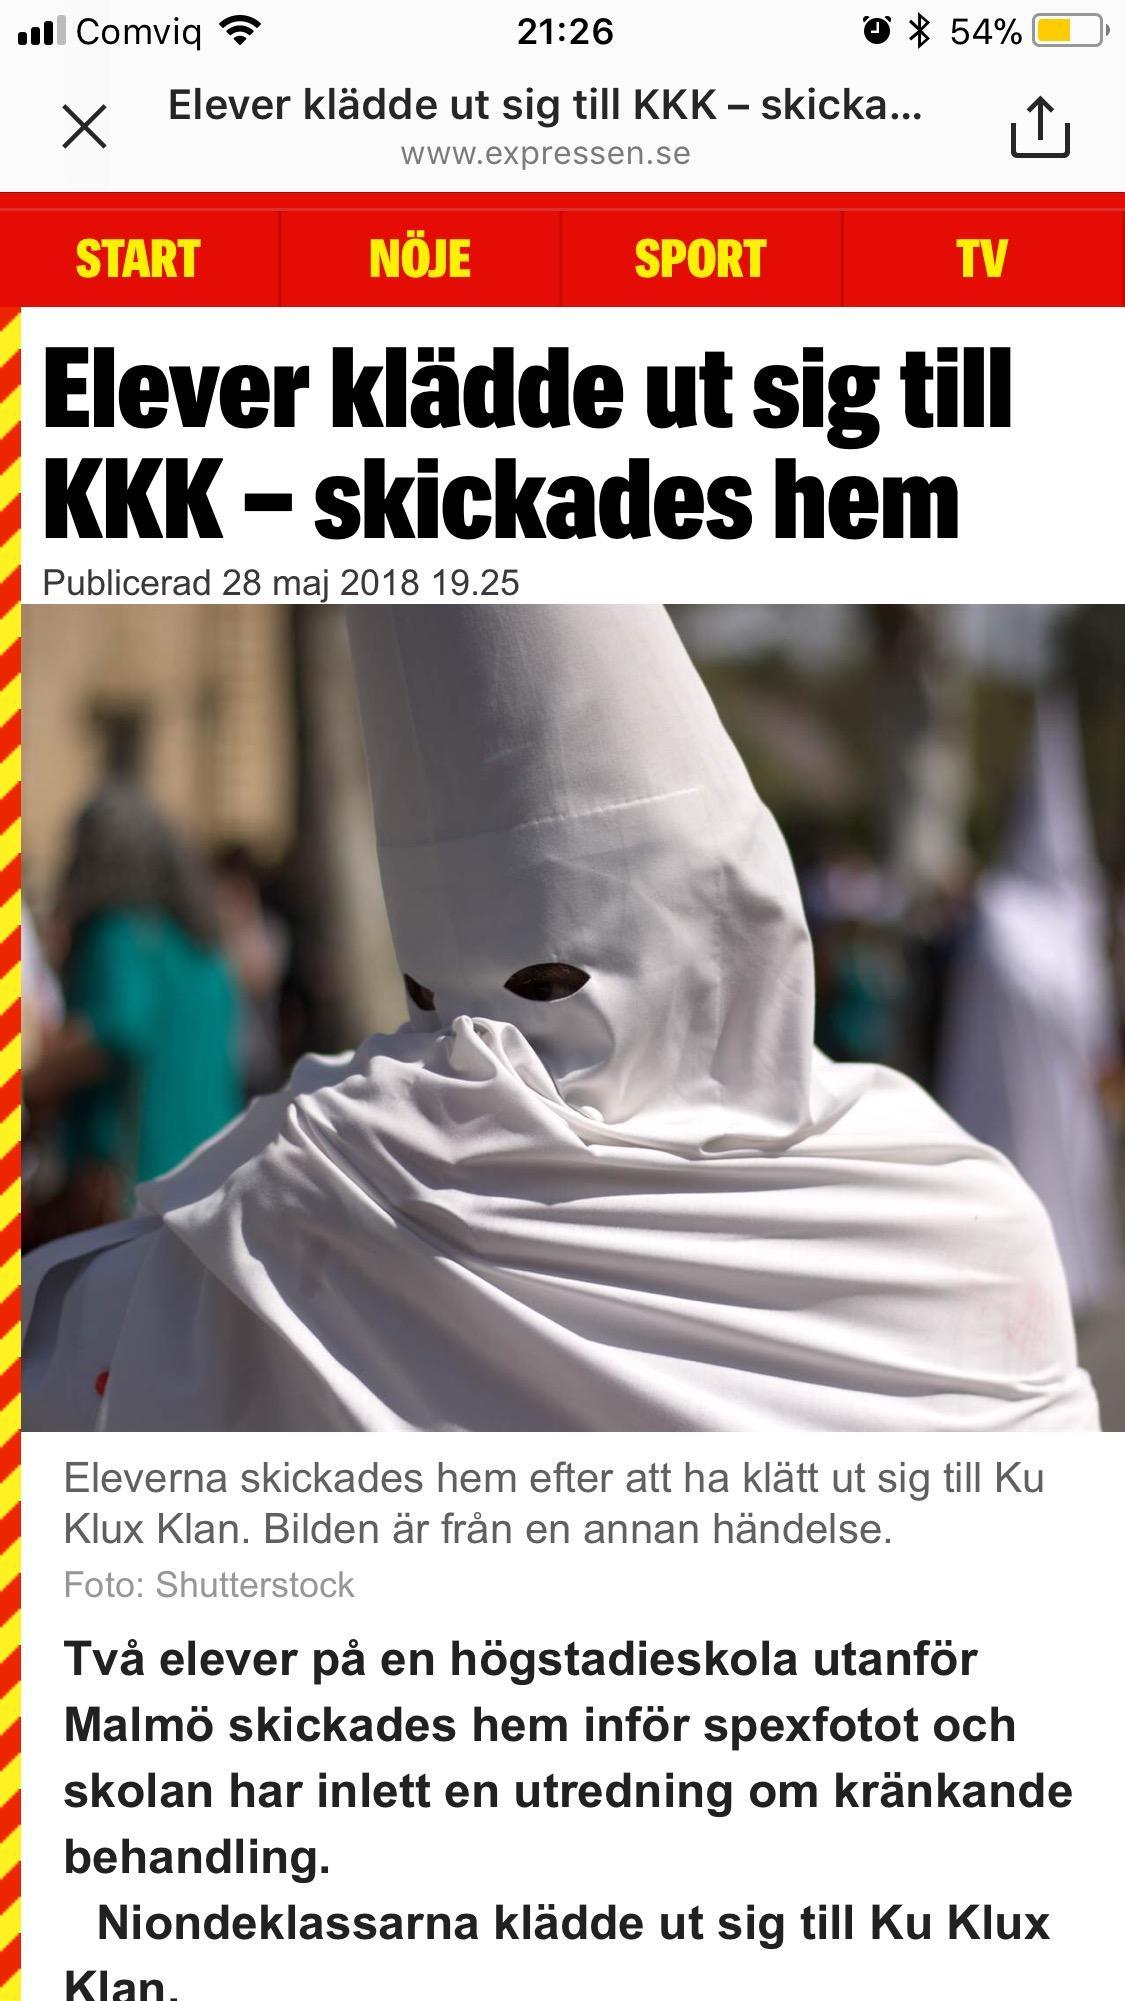 Lomma Pilängsskolan Sweden - Children dressed in KKK Outfits - IMG 2158 1